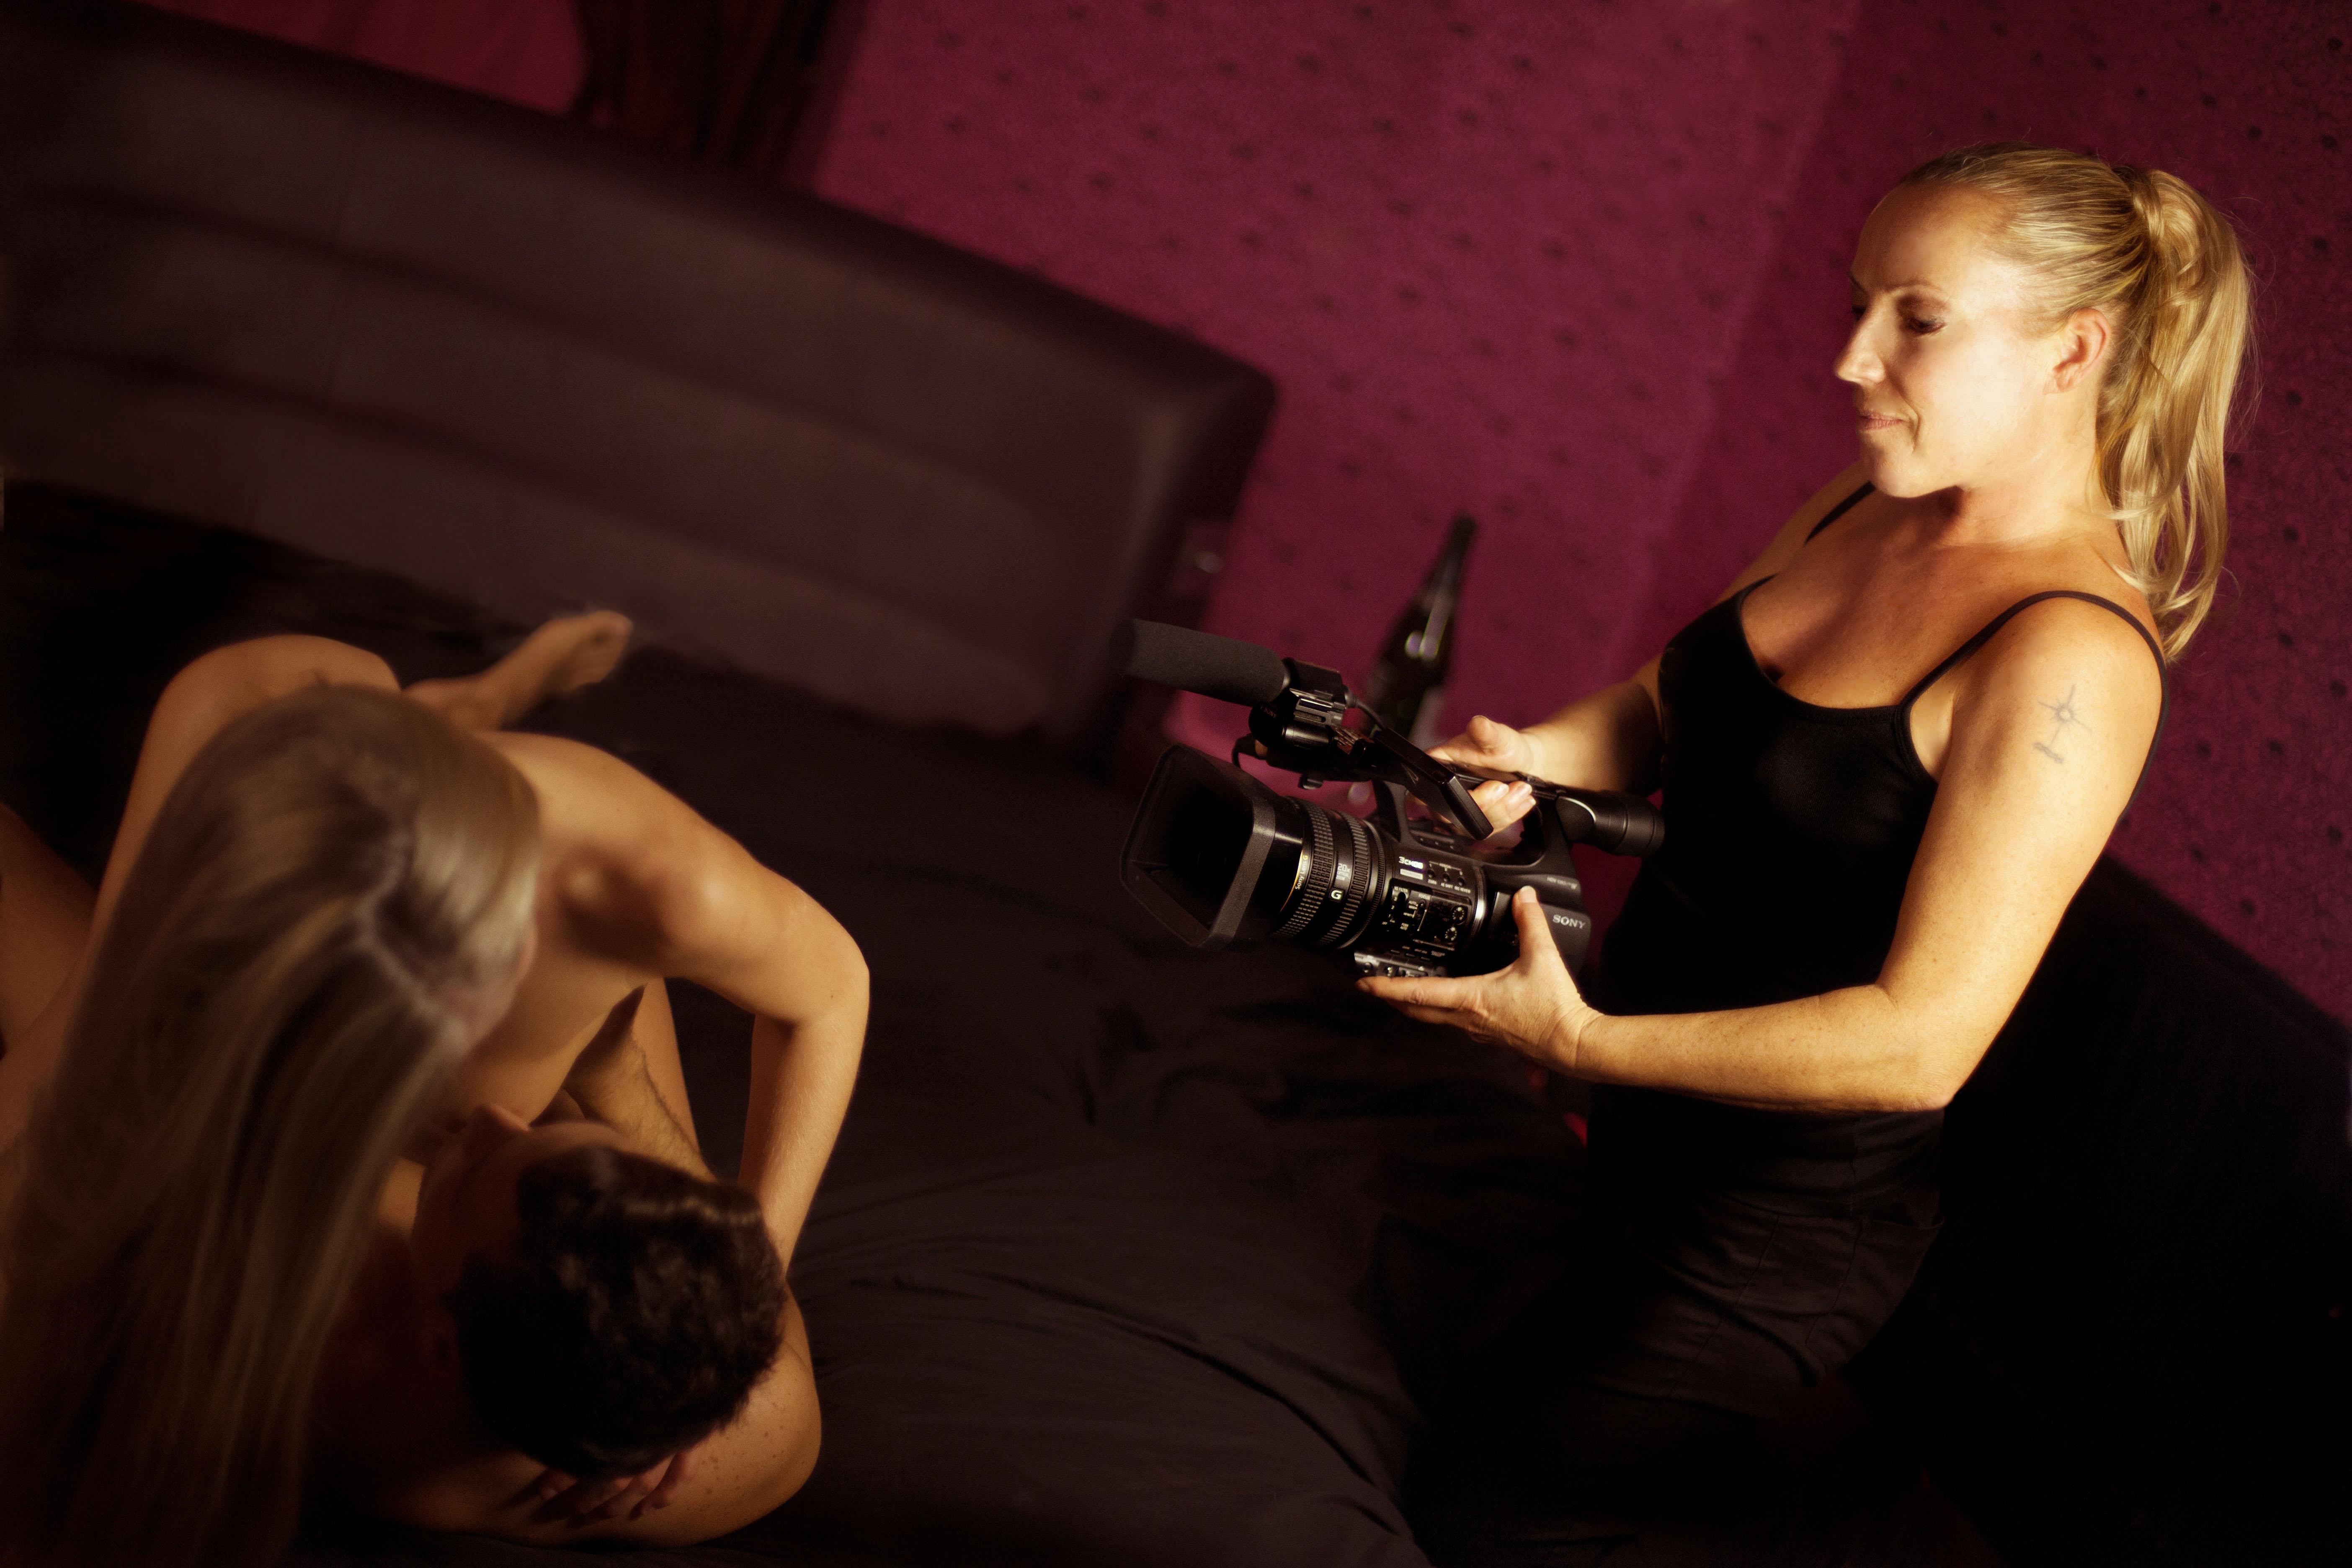 Reife Schlampe Ehefrau Pornos